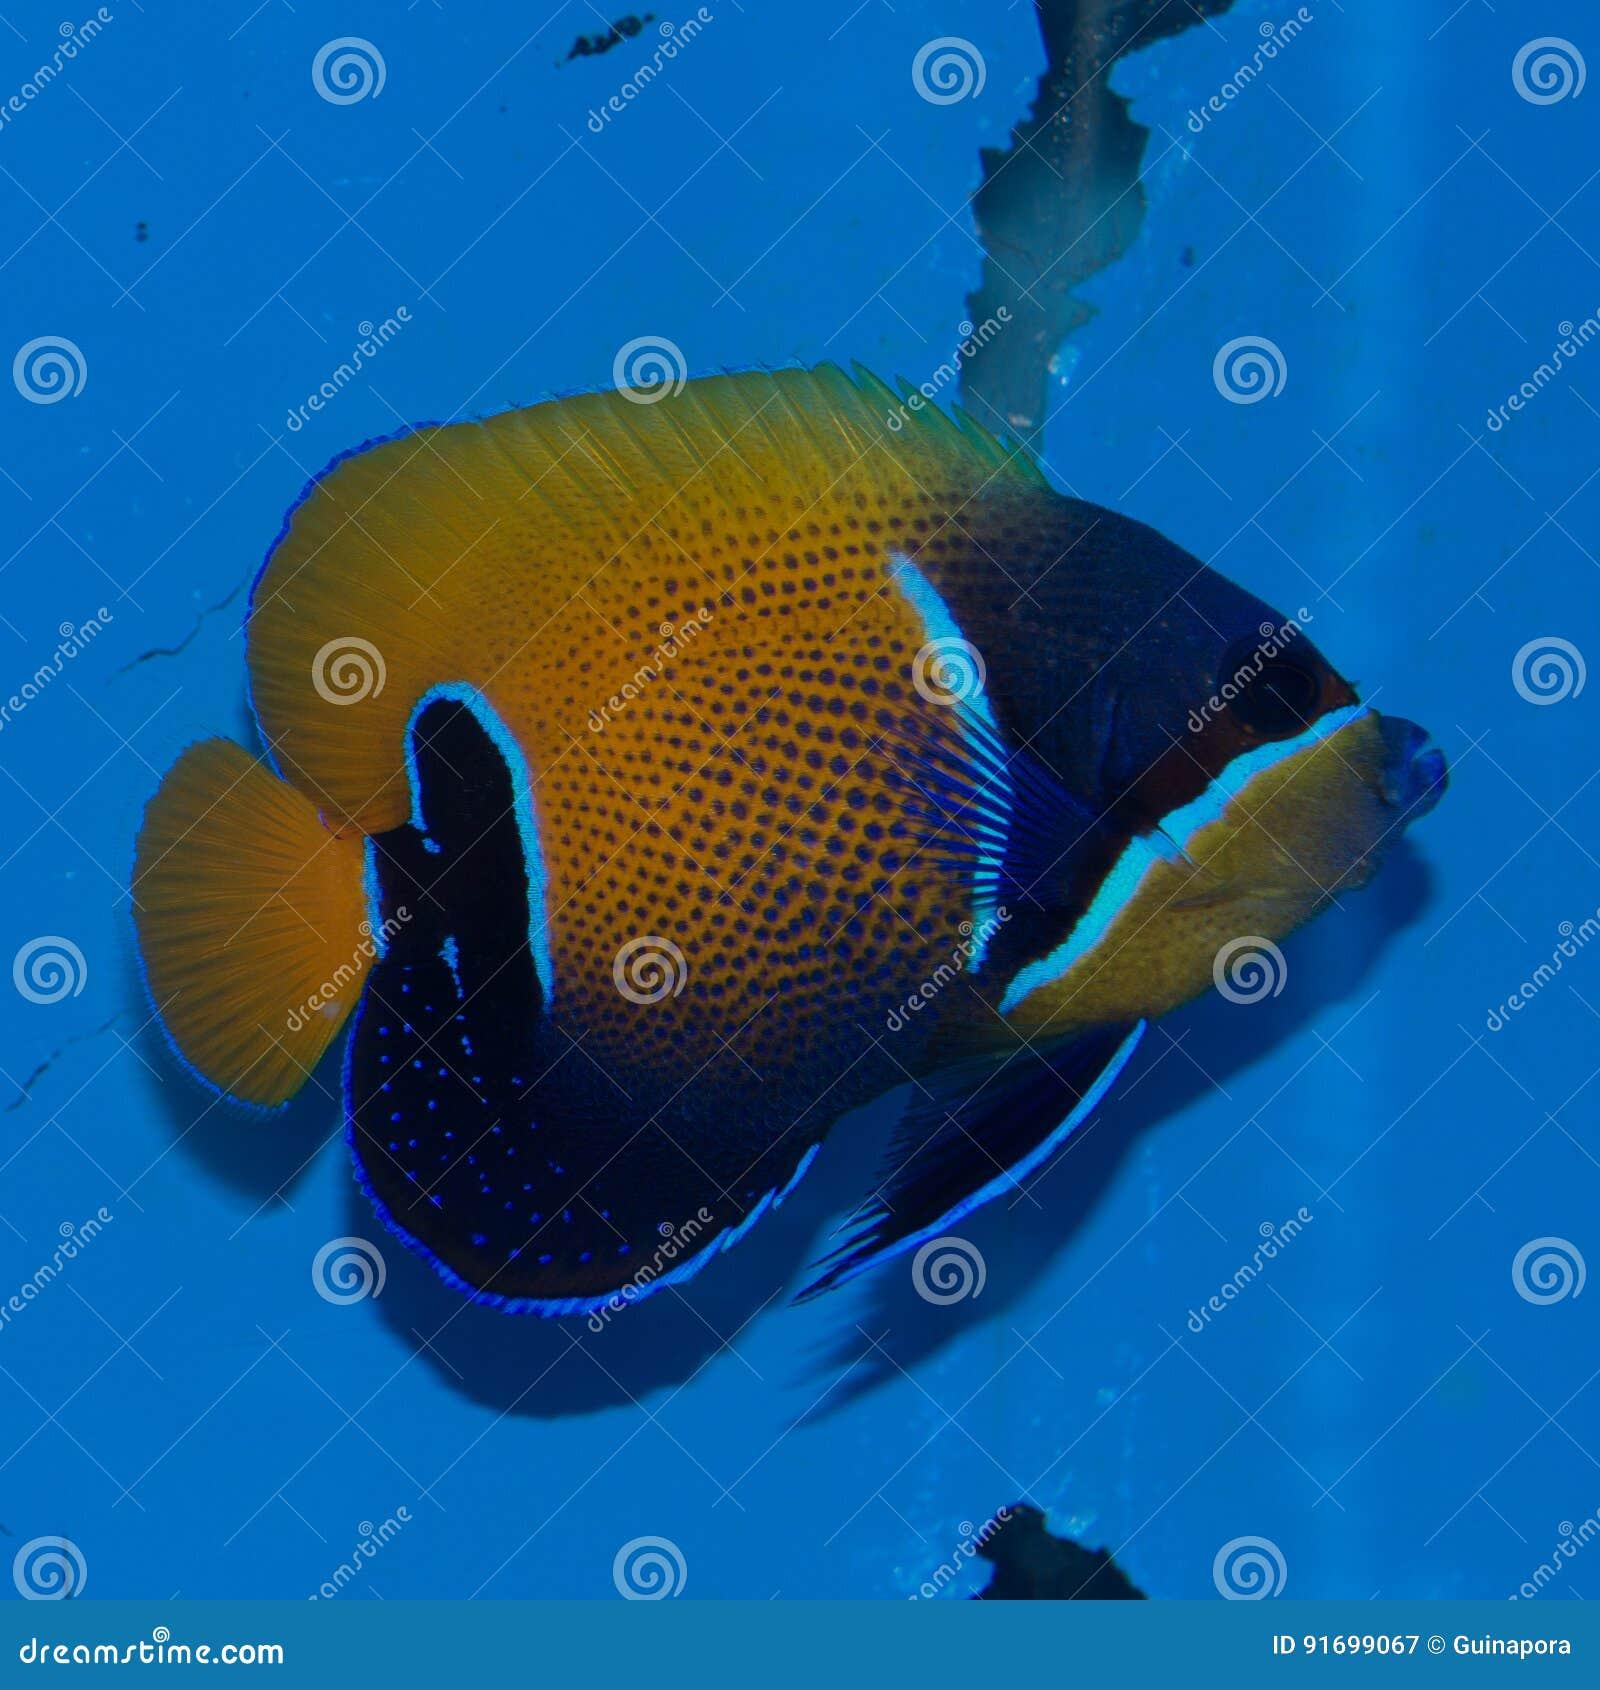 Majestic Angelfish Pomacanthus navarchus